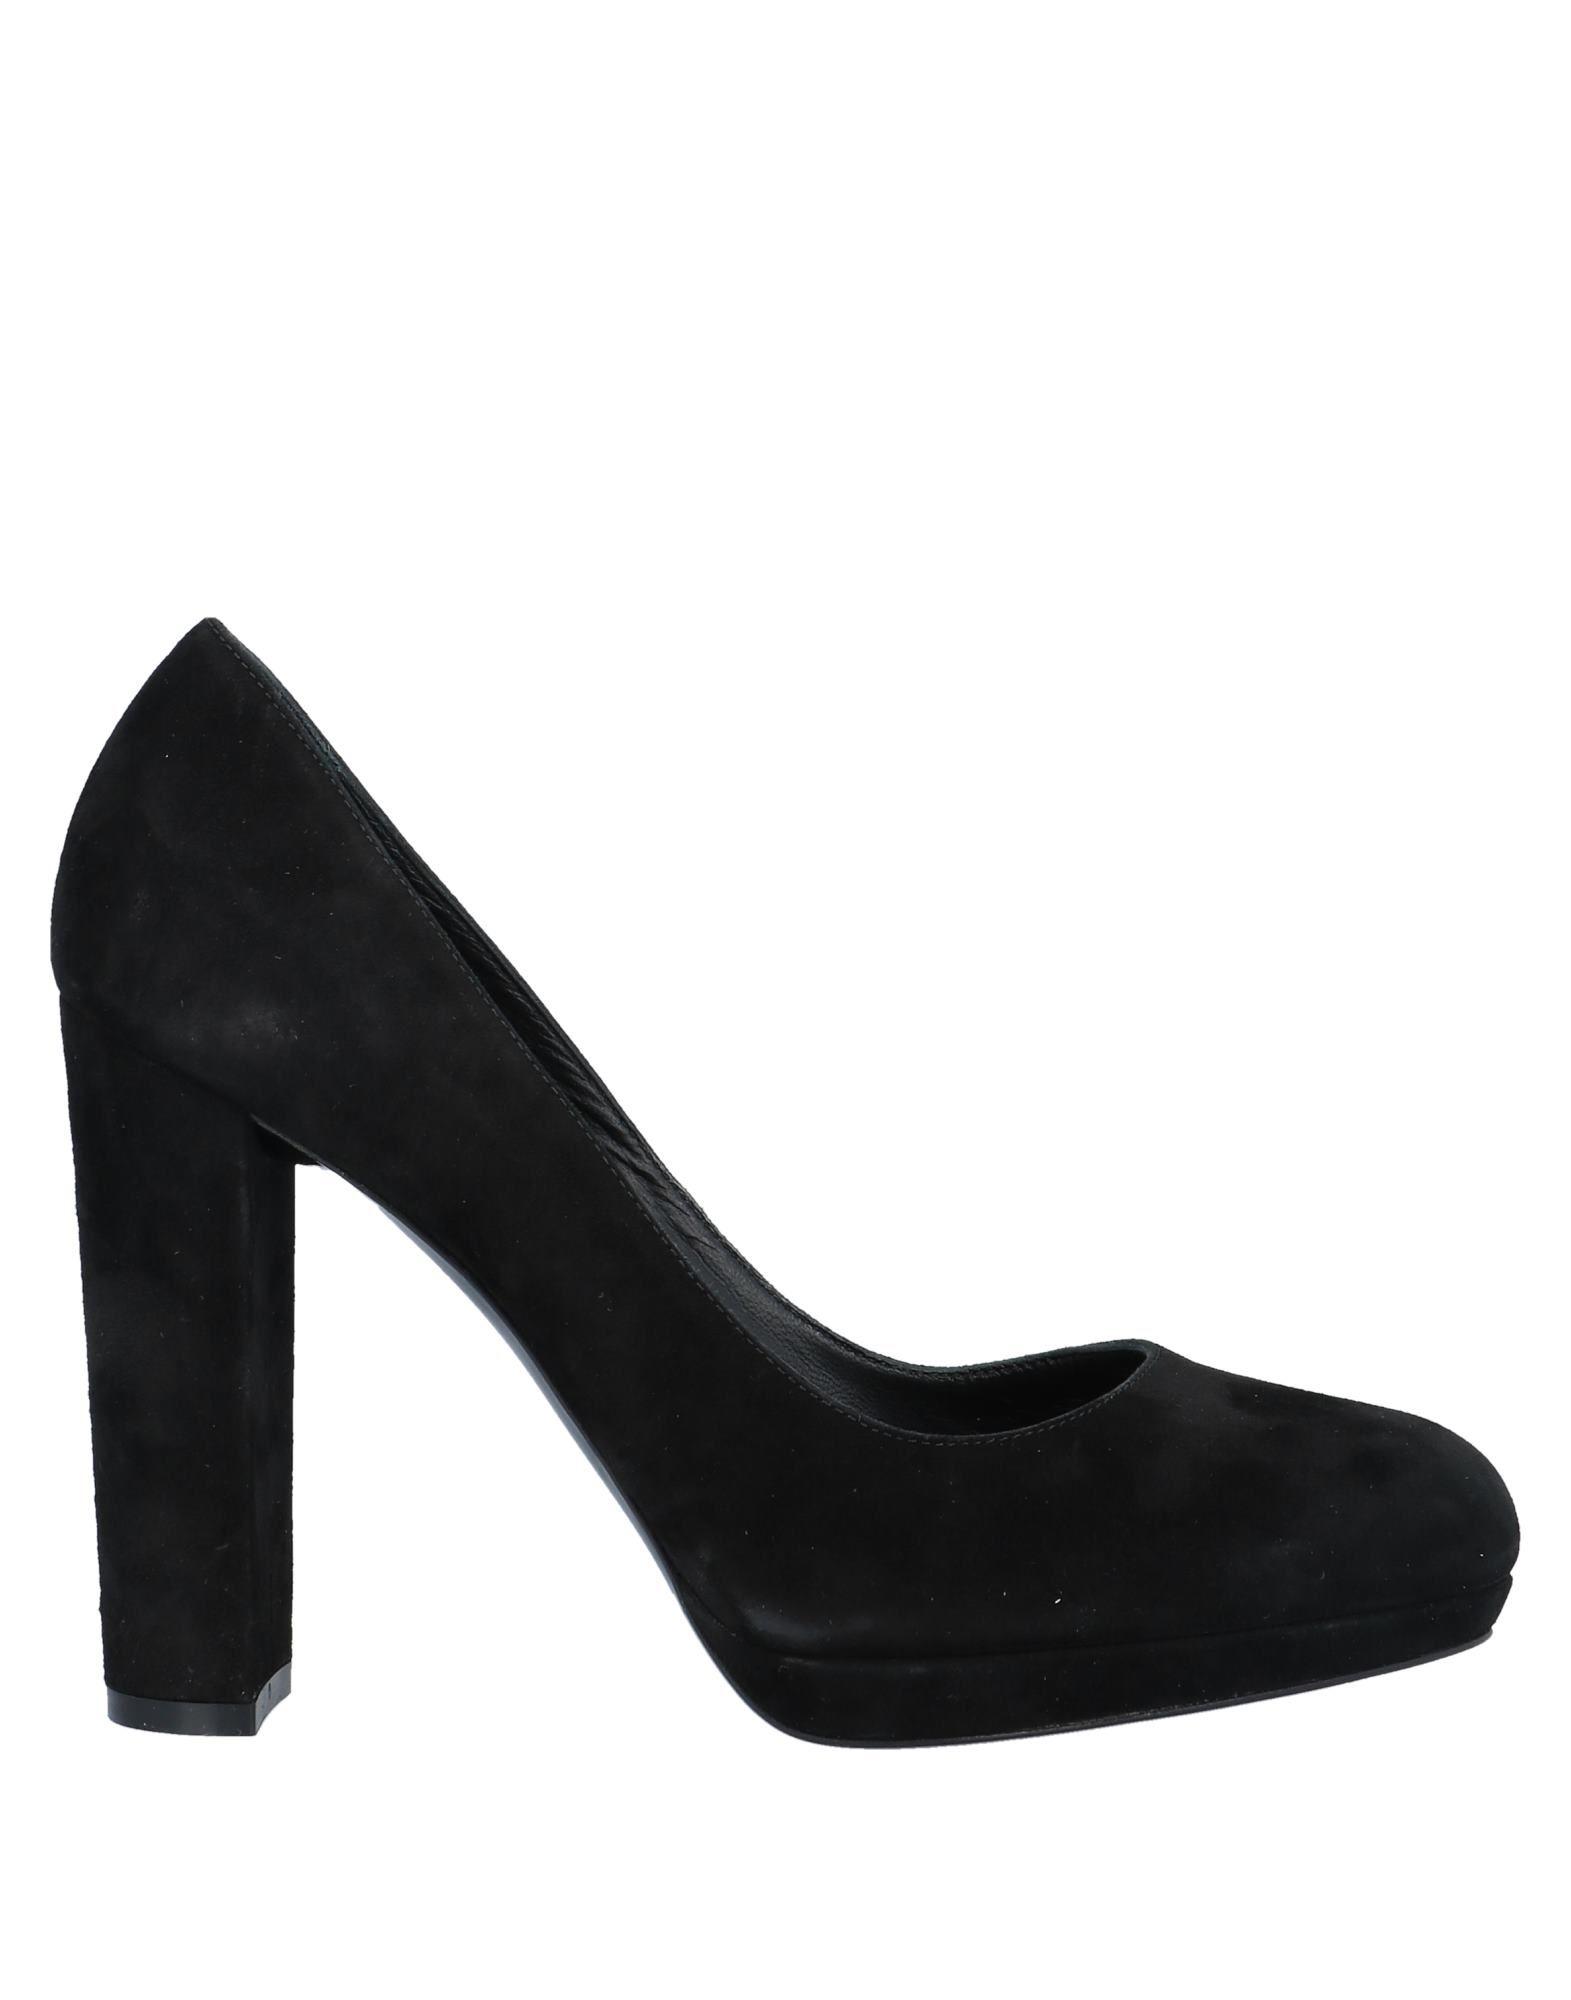 Фото - PEREGO SHOES Туфли women high heel shoes platform pumps woman thin high heels party wedding shoes ladies kitten heels plus size 34 40 41 42 43